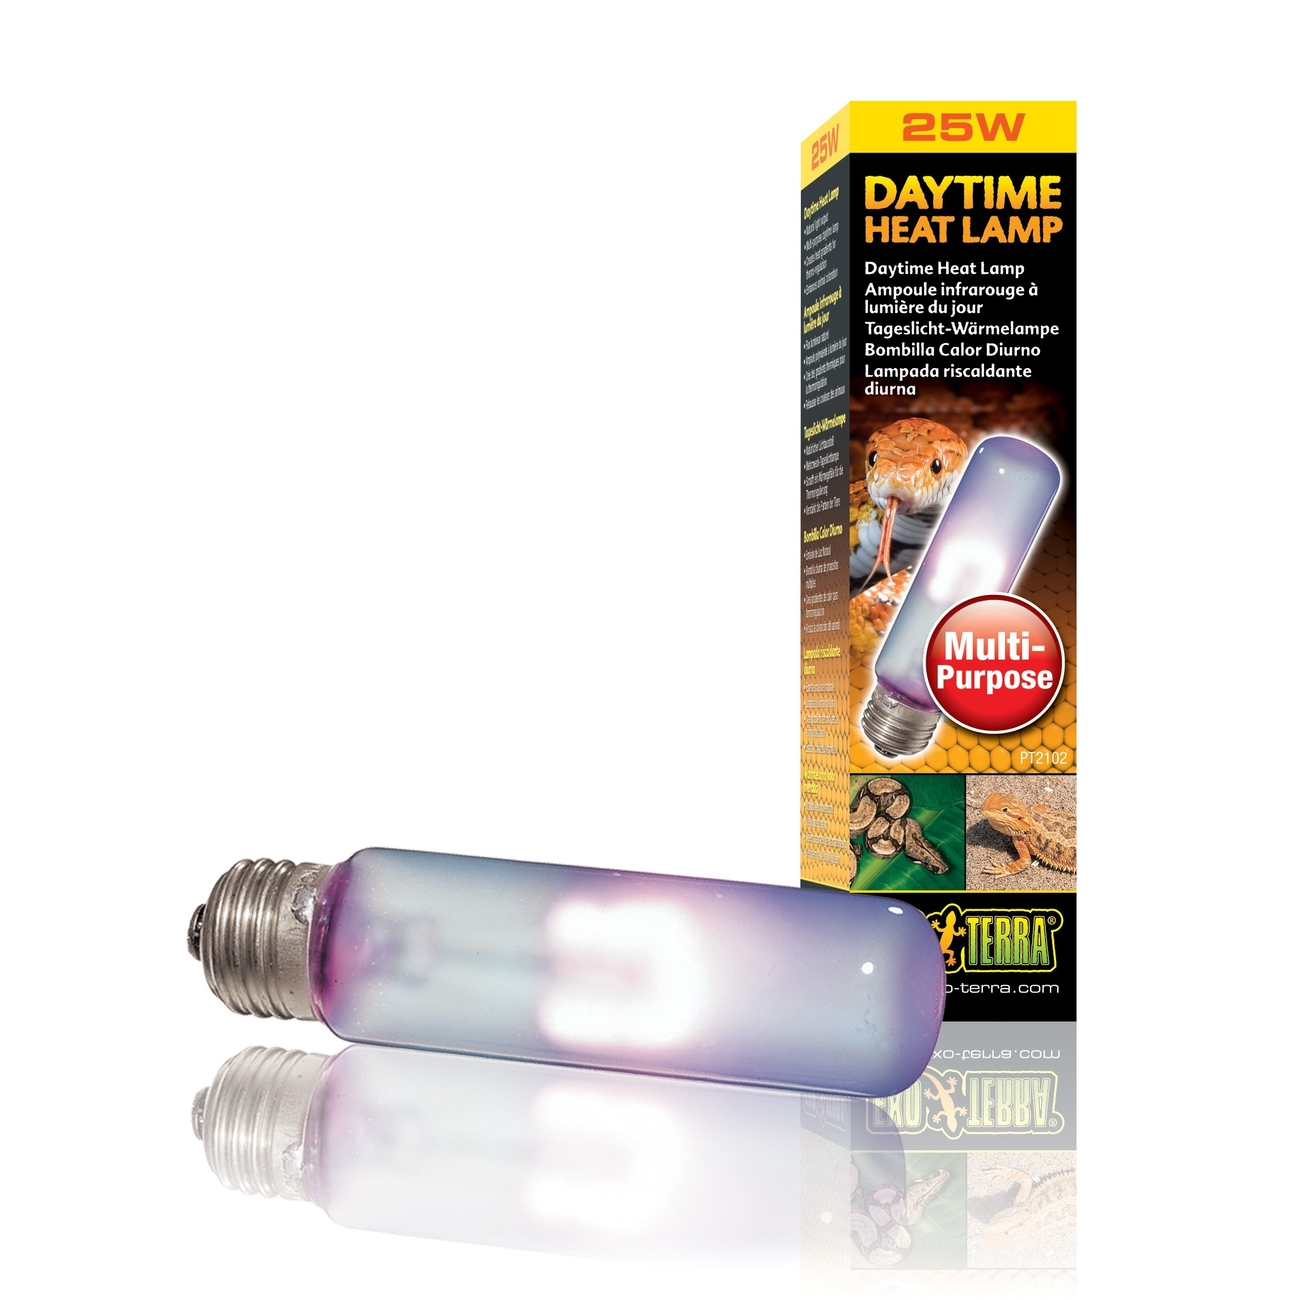 Exo Terra - Daytime Heat Lampe Bild 3